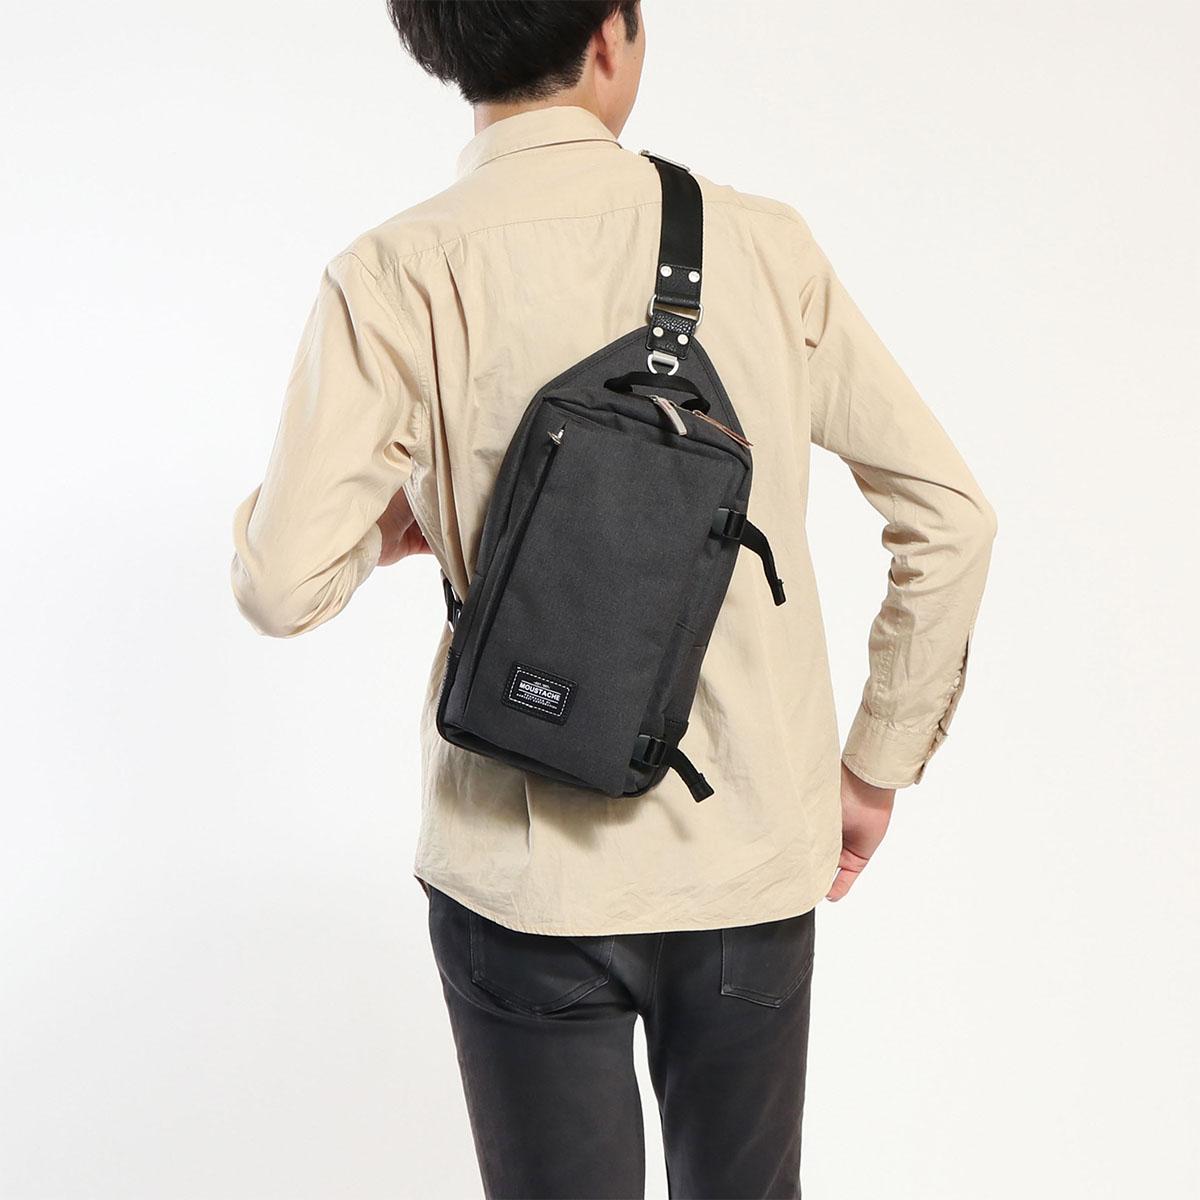 MOUSTACHE body bag diagonally large tablet storage vertical type men s  ladies VUV-4600 1387777a43b0e